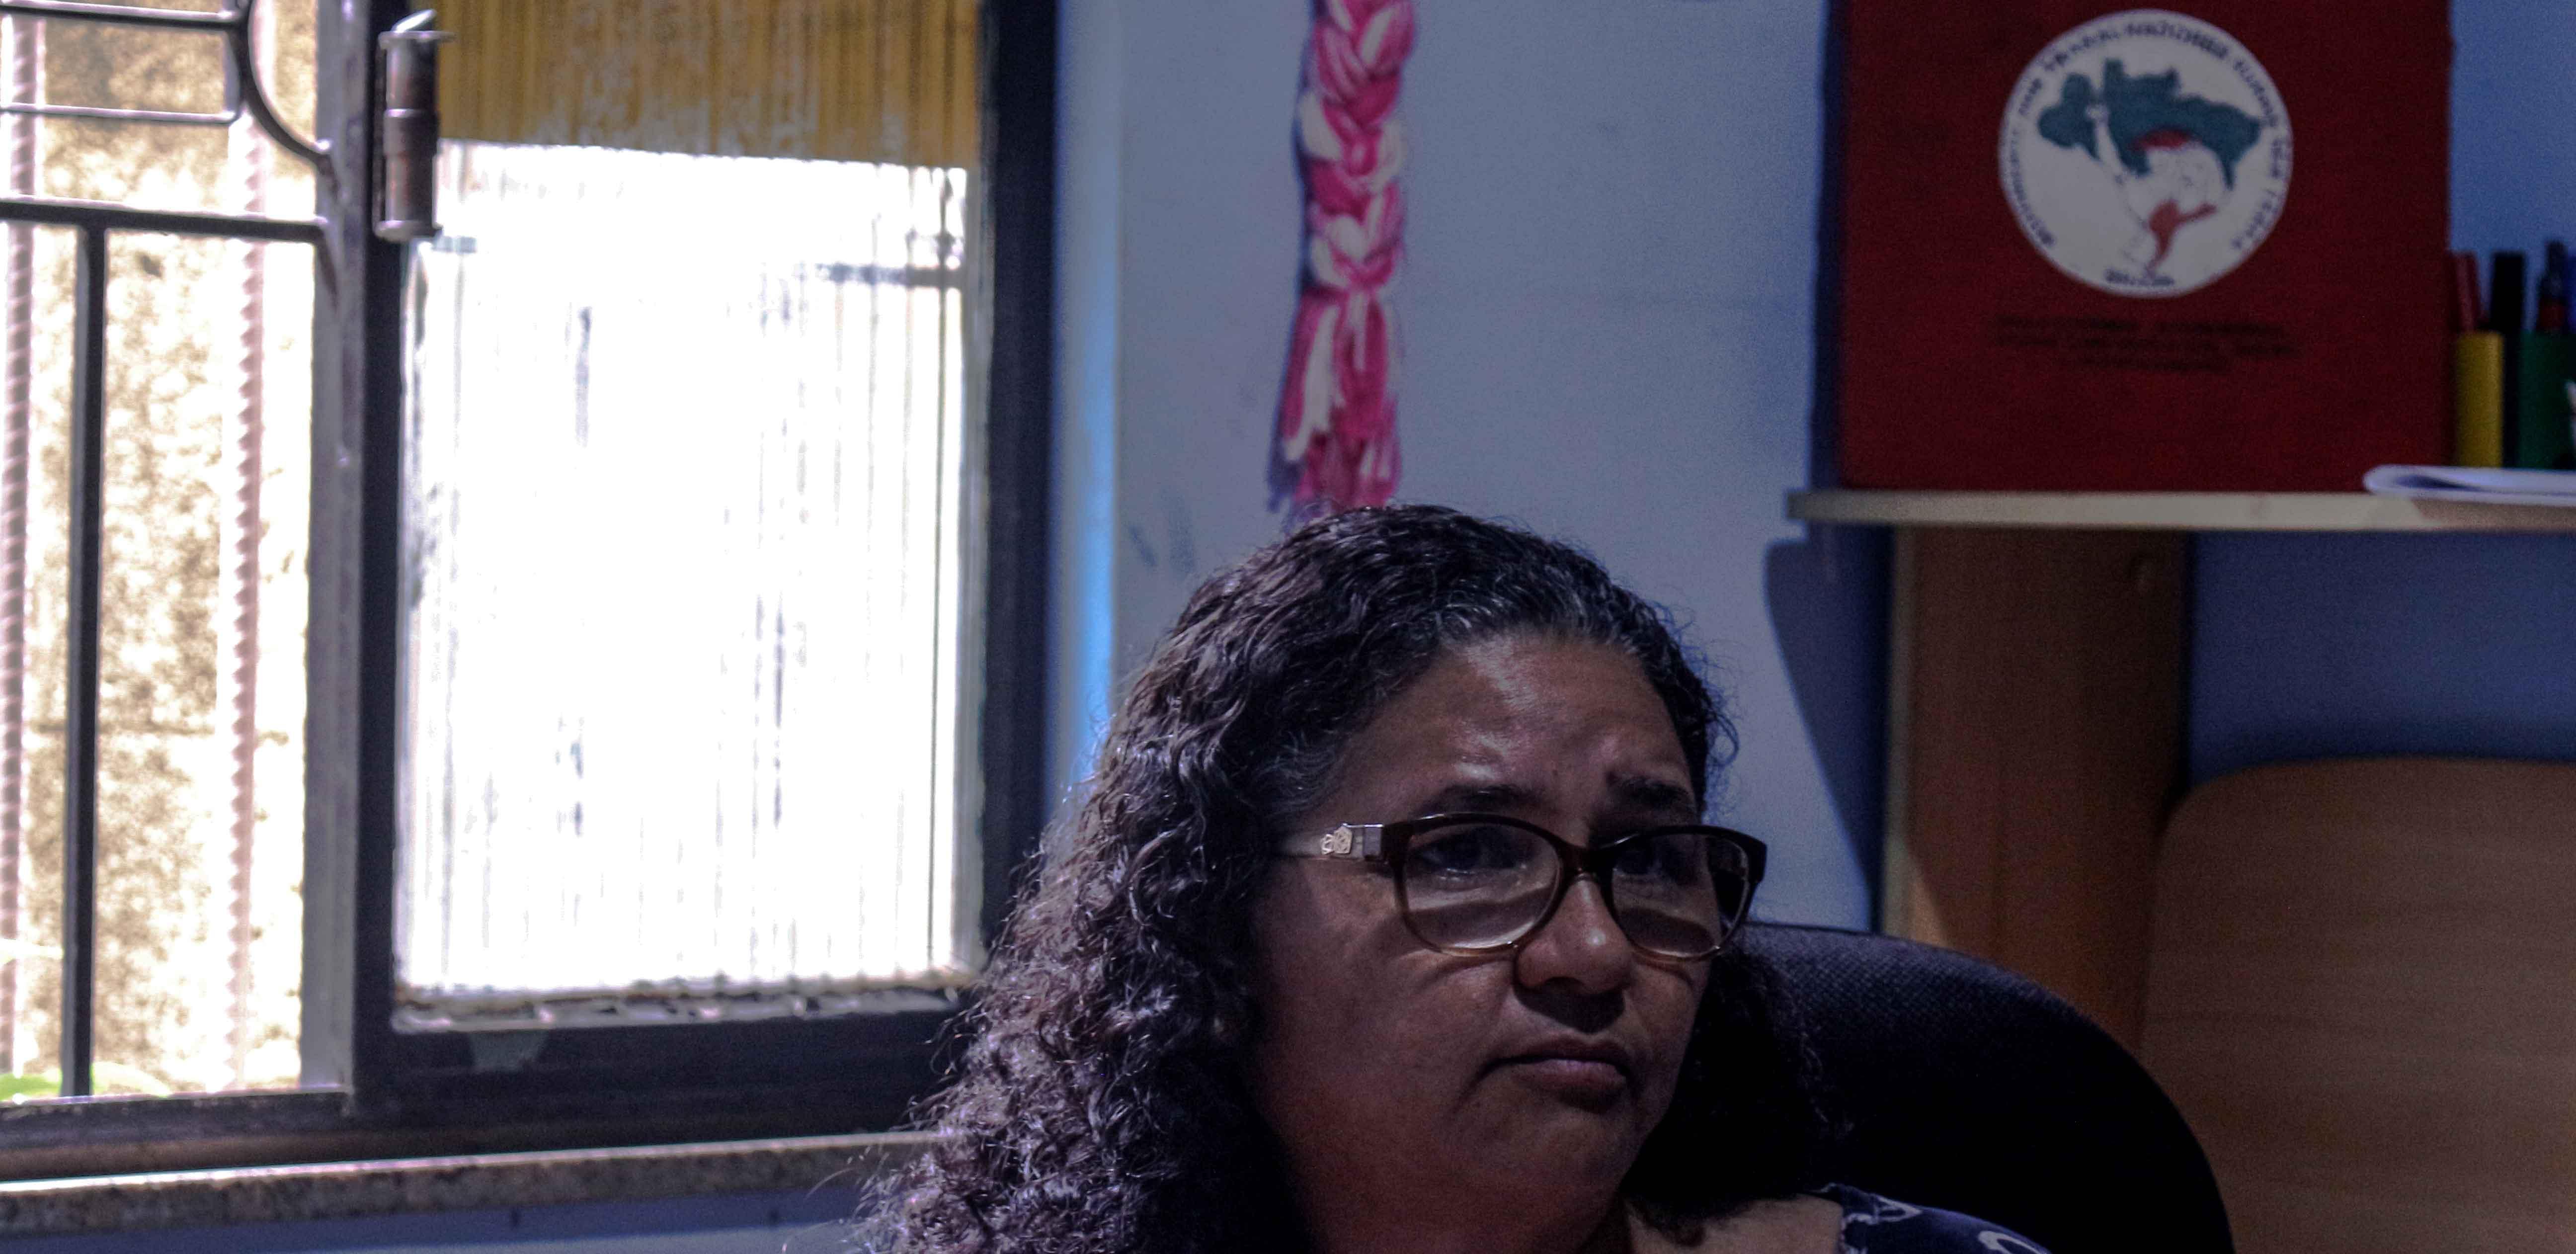 Izabel Rodrigues Lopes Filho, dirIgente estadual do MST, conheceu Fusquinha em 1992.